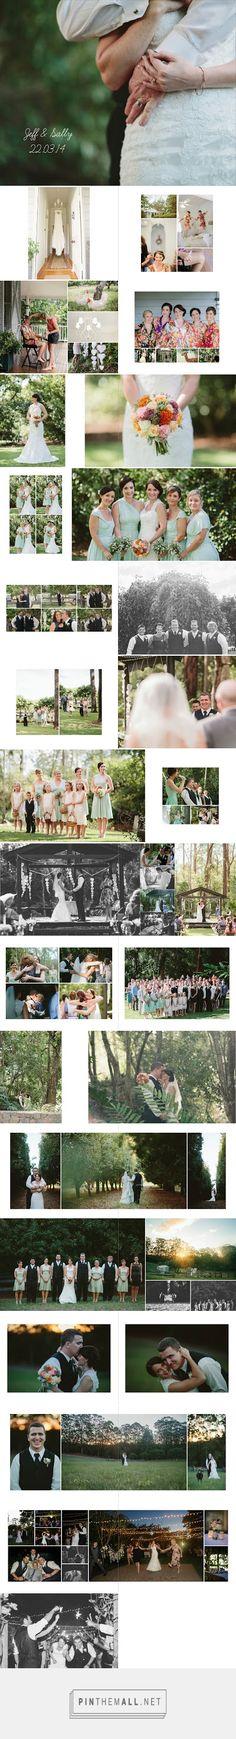 Chocolate Beige Designs: Sally & Jeff's wedding album, images by Rikki Jones.